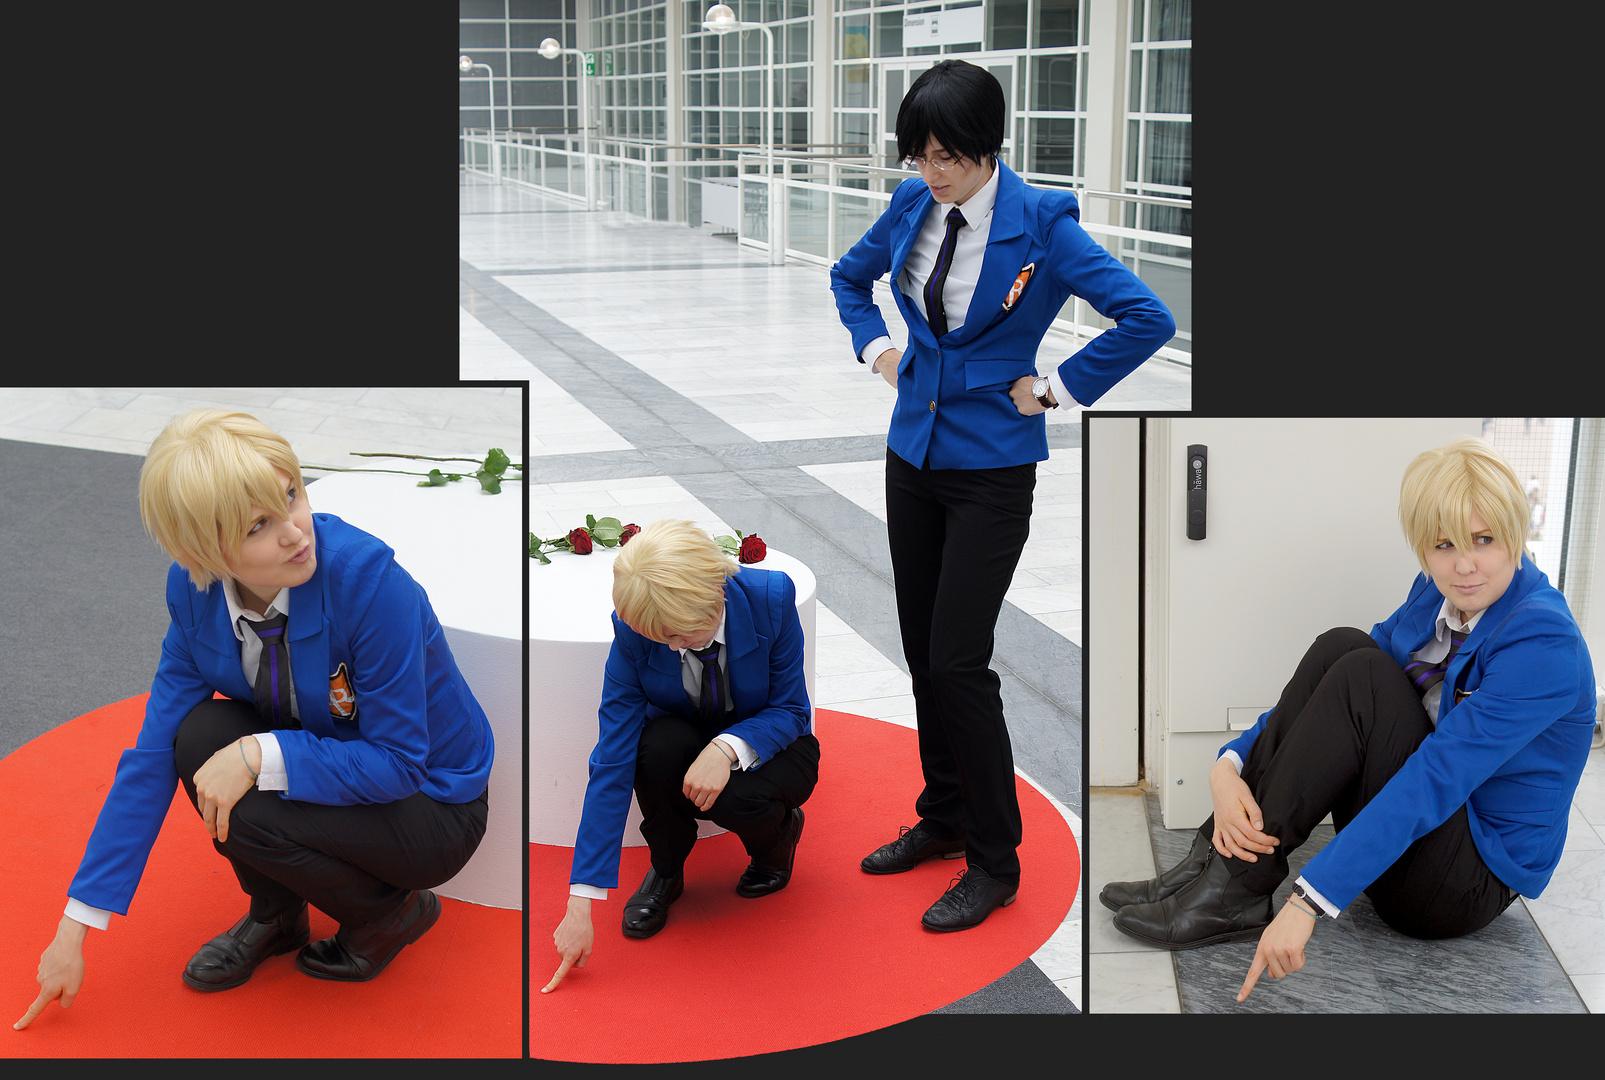 OHSHC 8: Tamaki schmollt wegen Kyoya und Haruhi